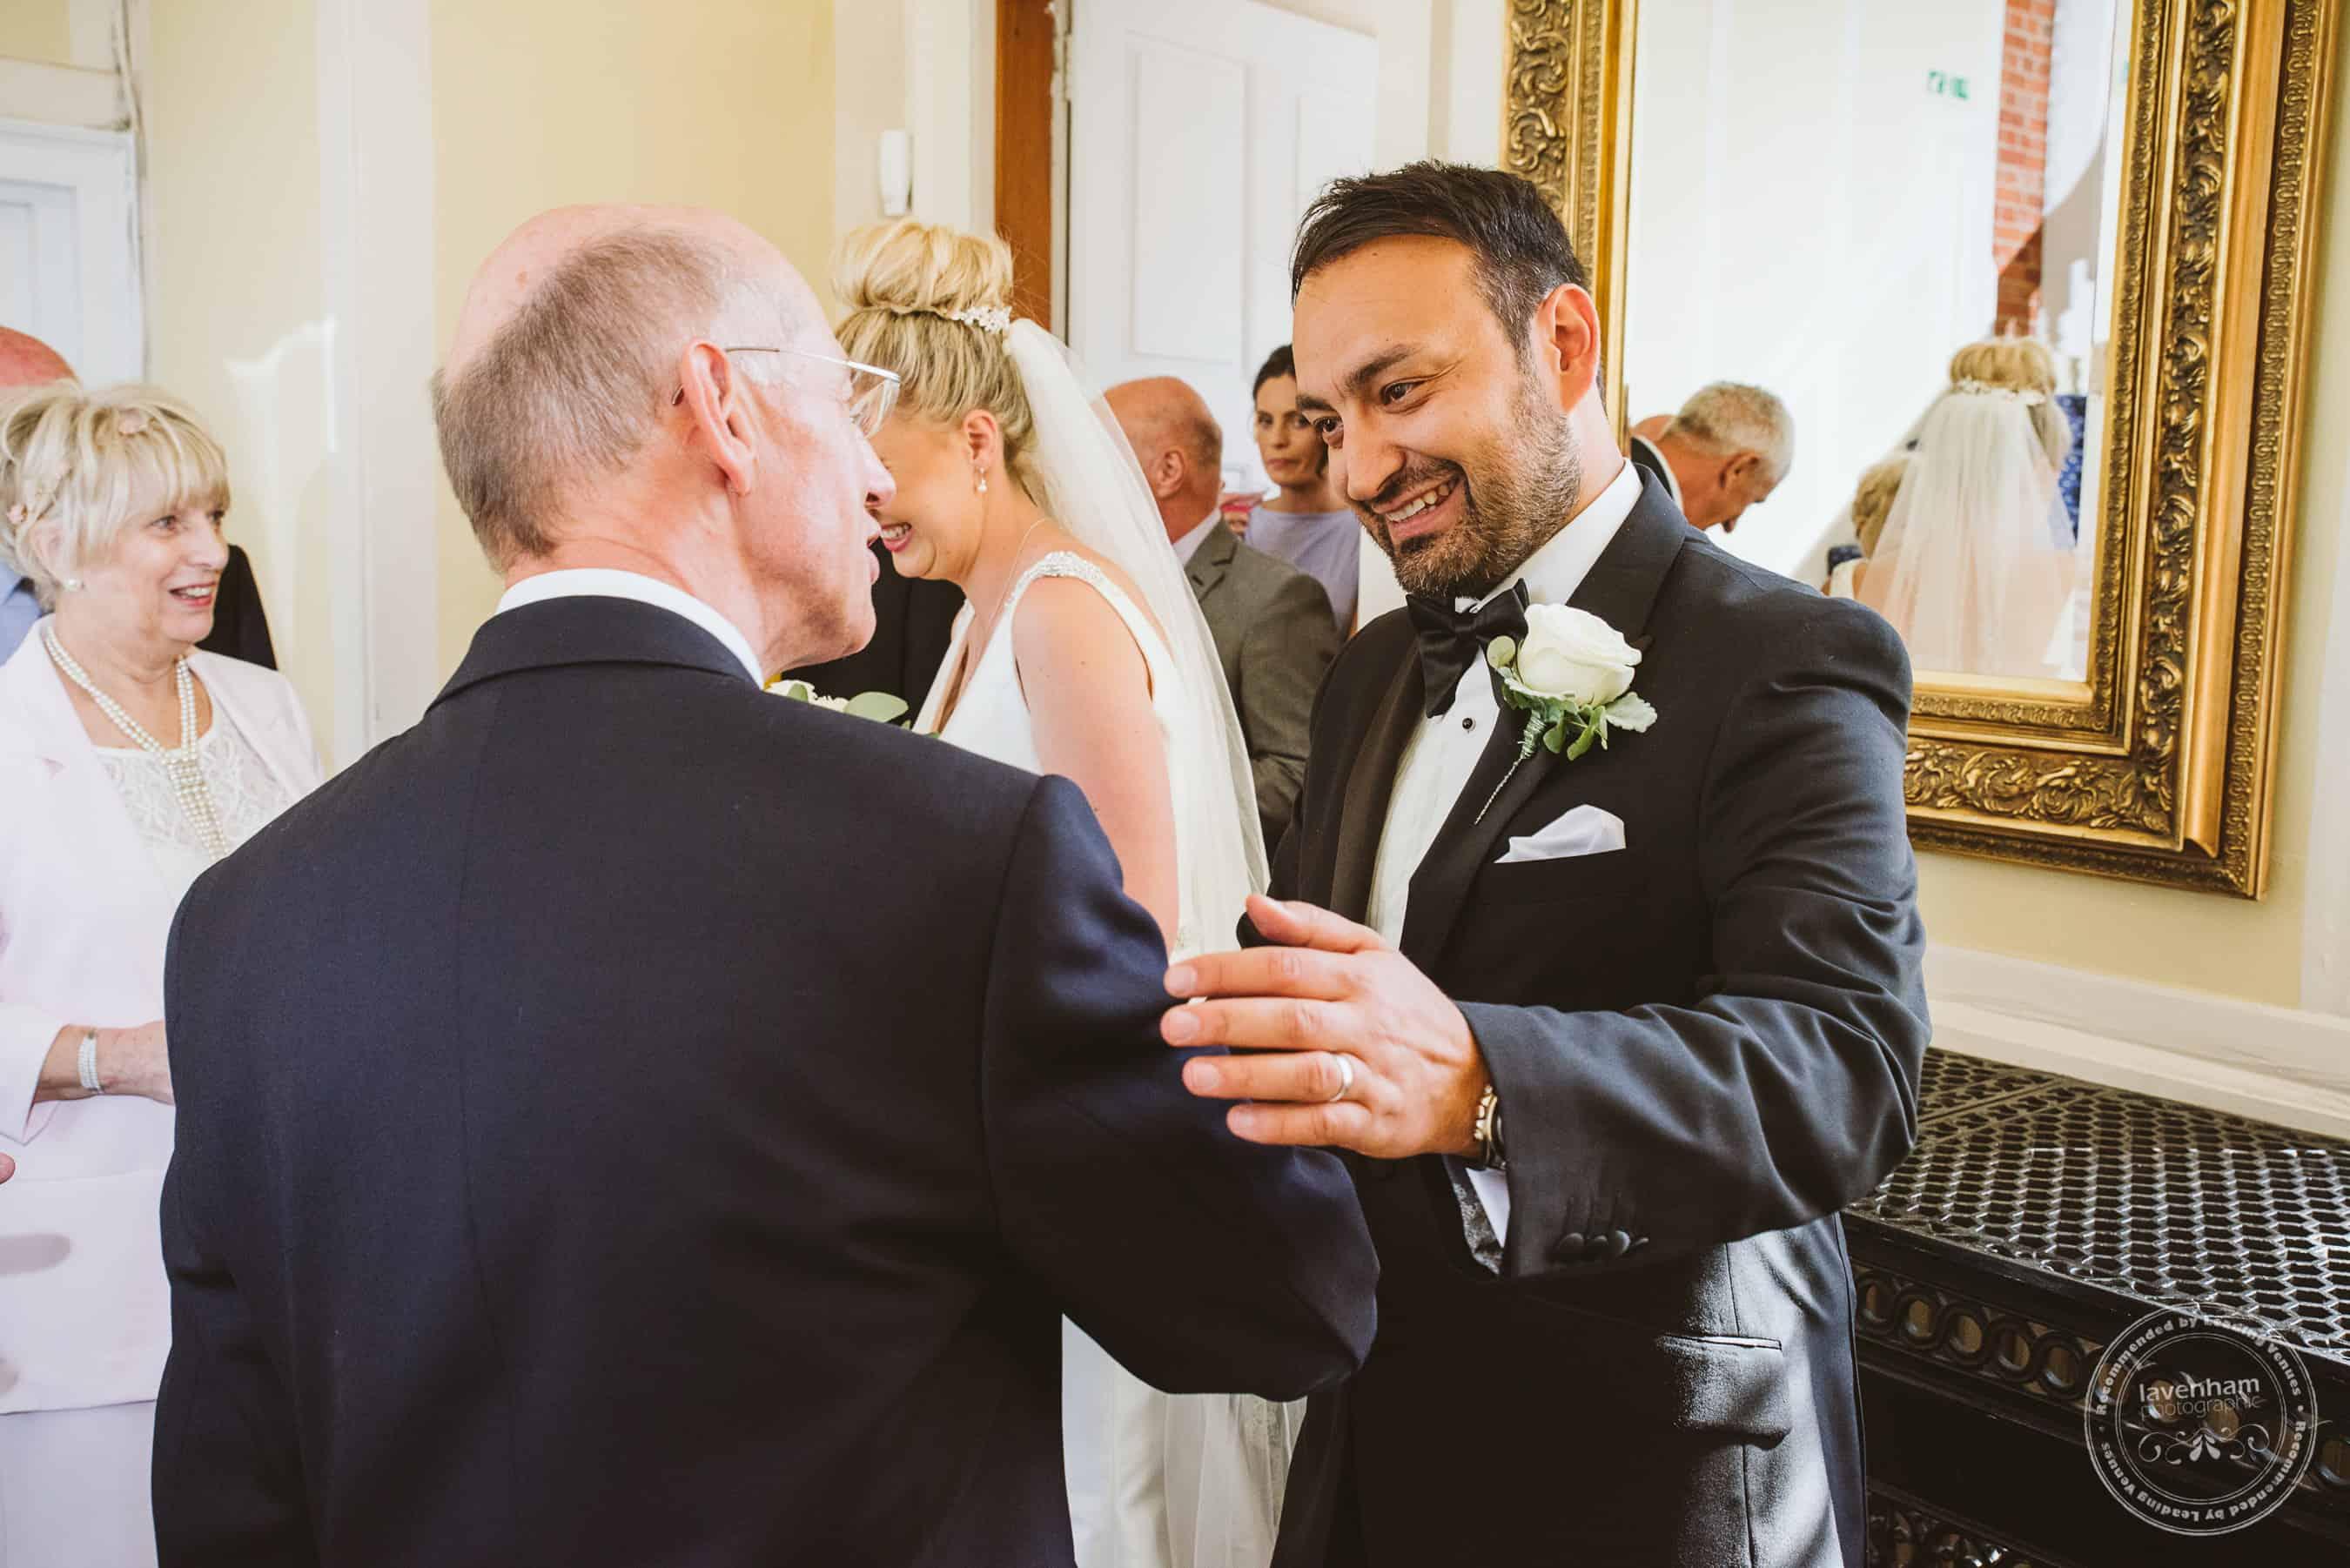 220618 Gosfield Hall Wedding Photography Lavenham Photographic 0144